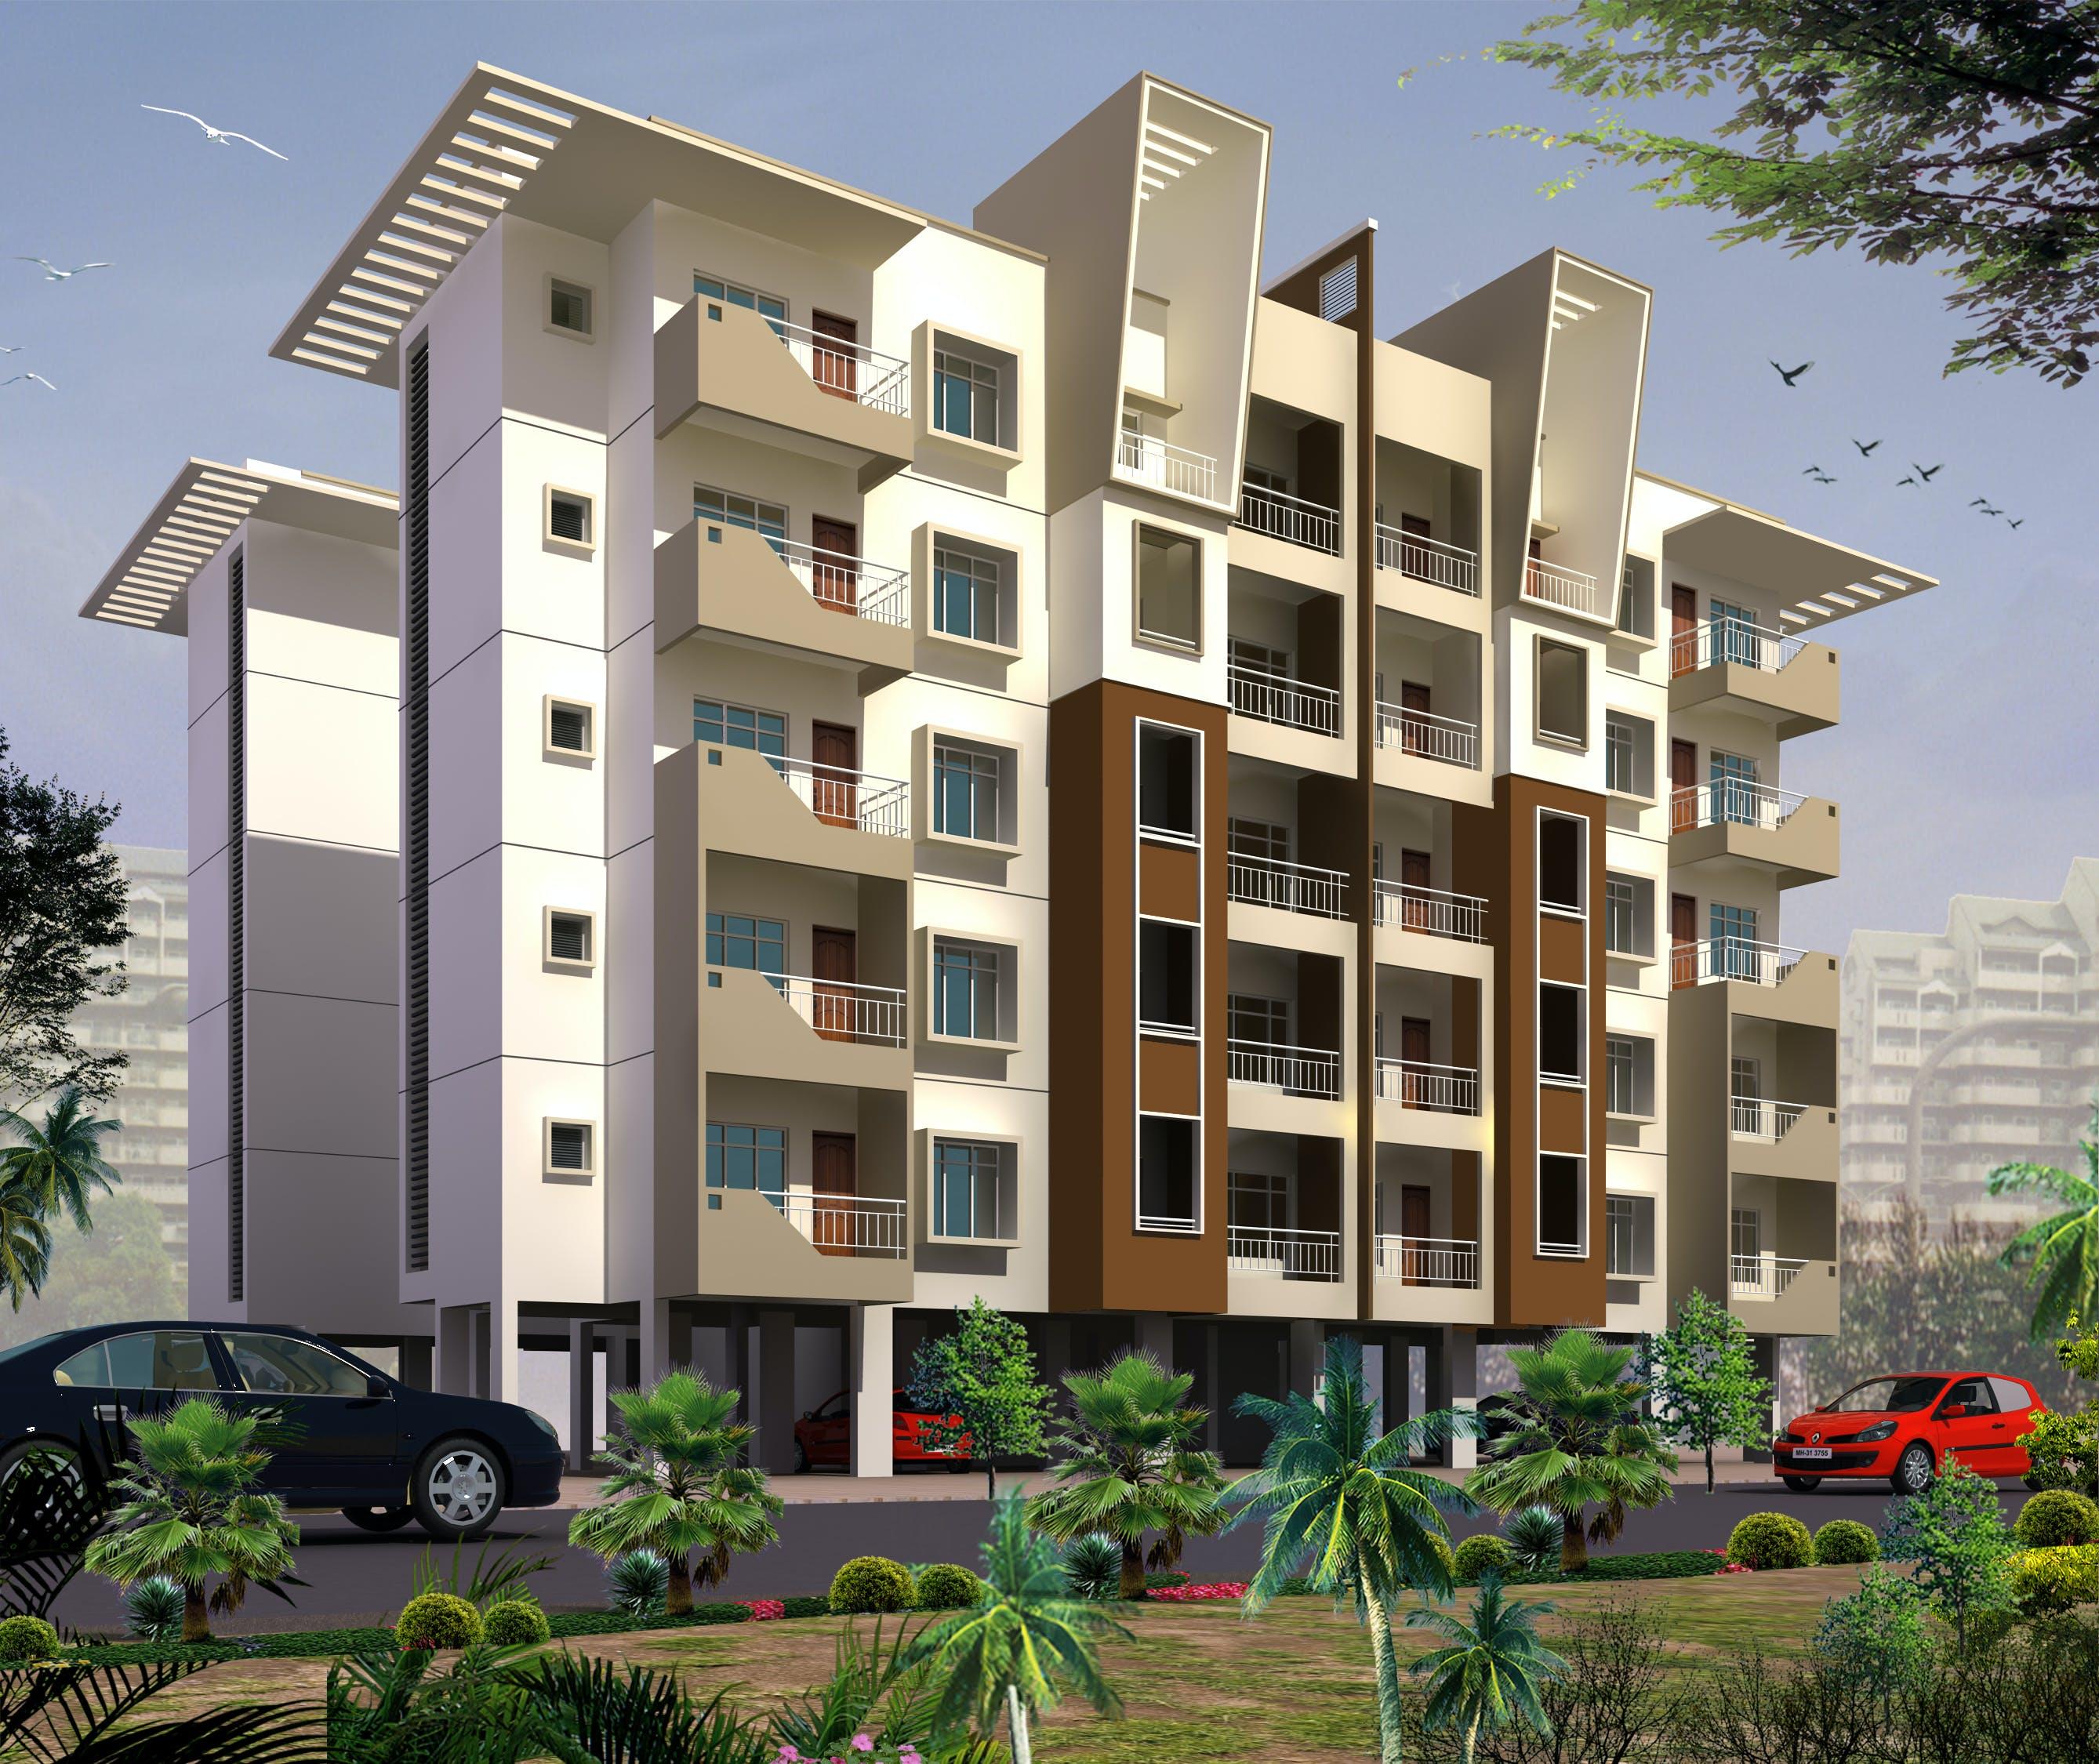 Affordable Housing Scheme Under JNNURM's BUSP-on PPP Model